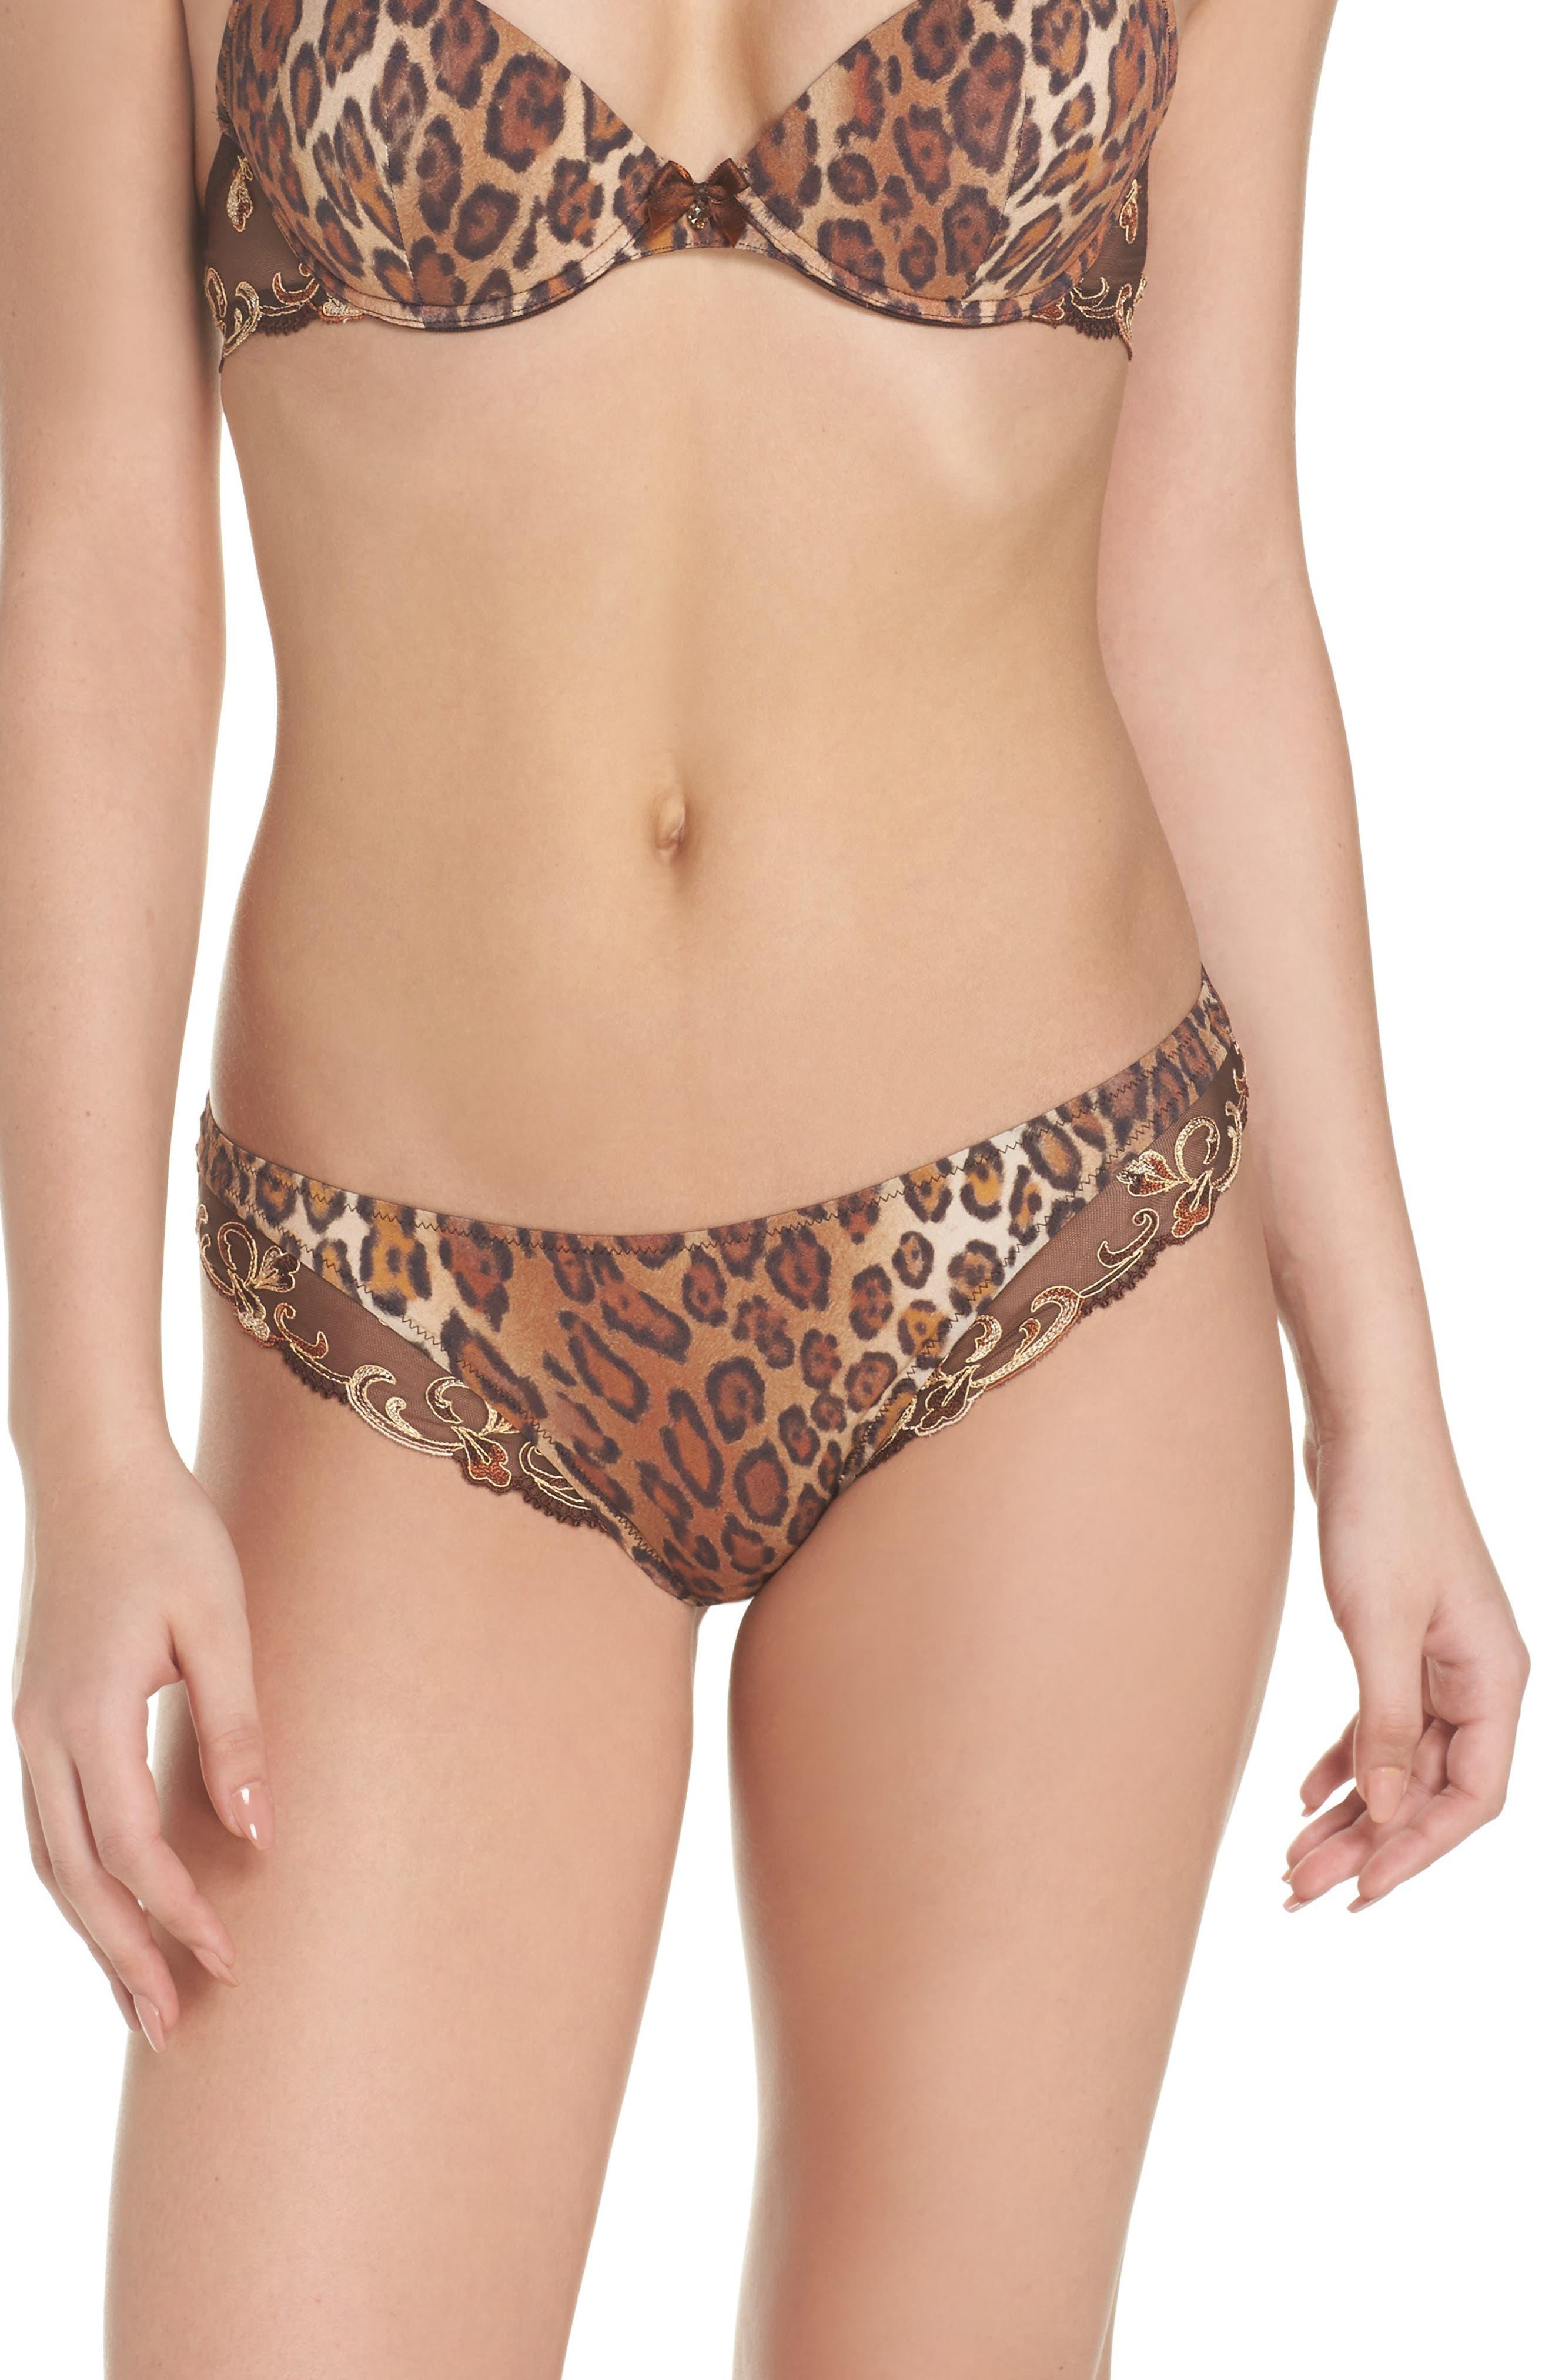 Distinction Fauve Panties,                         Main,                         color, Moka Fauve